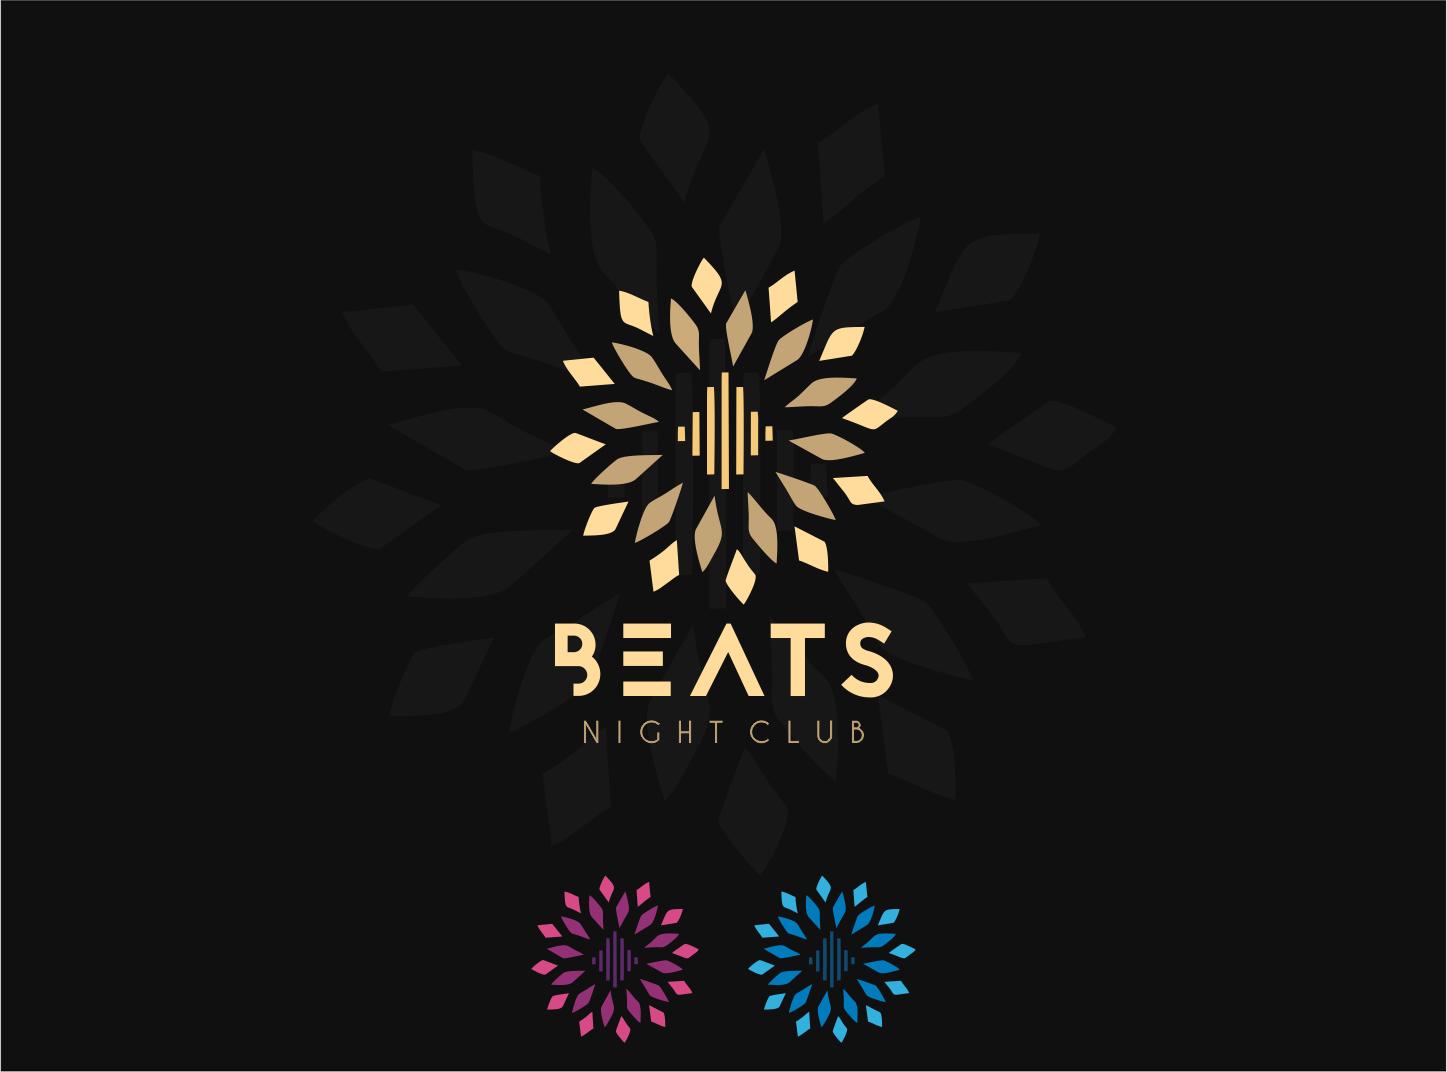 Serious, Elegant, Night Club Logo Design for Beats by.